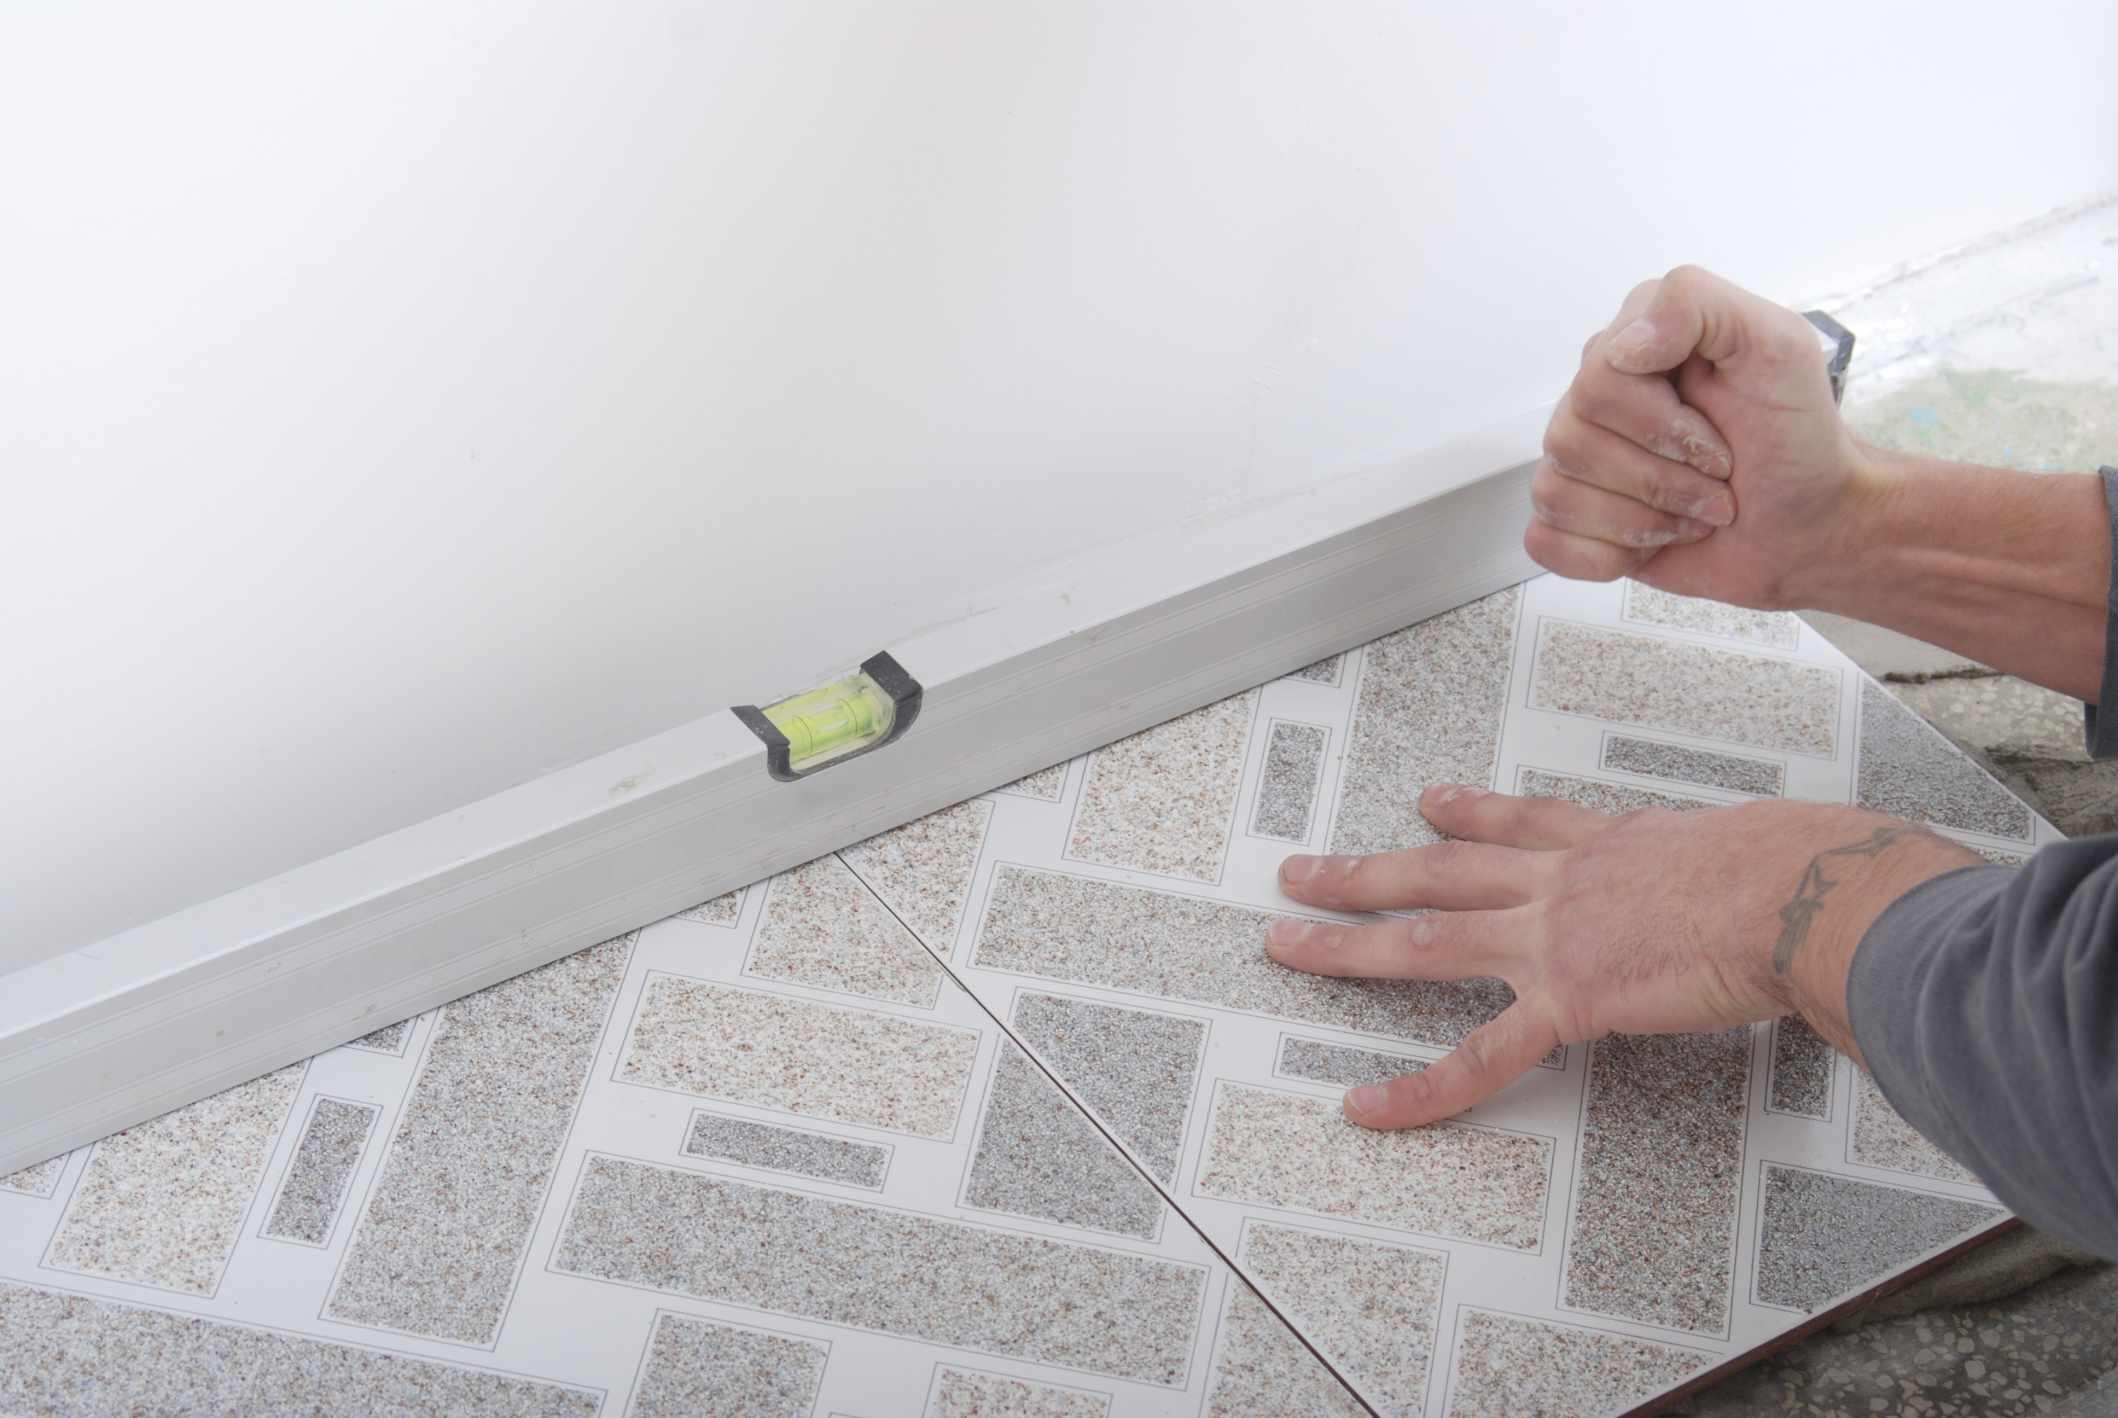 Adhesive Floor Tiles vs. Self-Stick Tiles